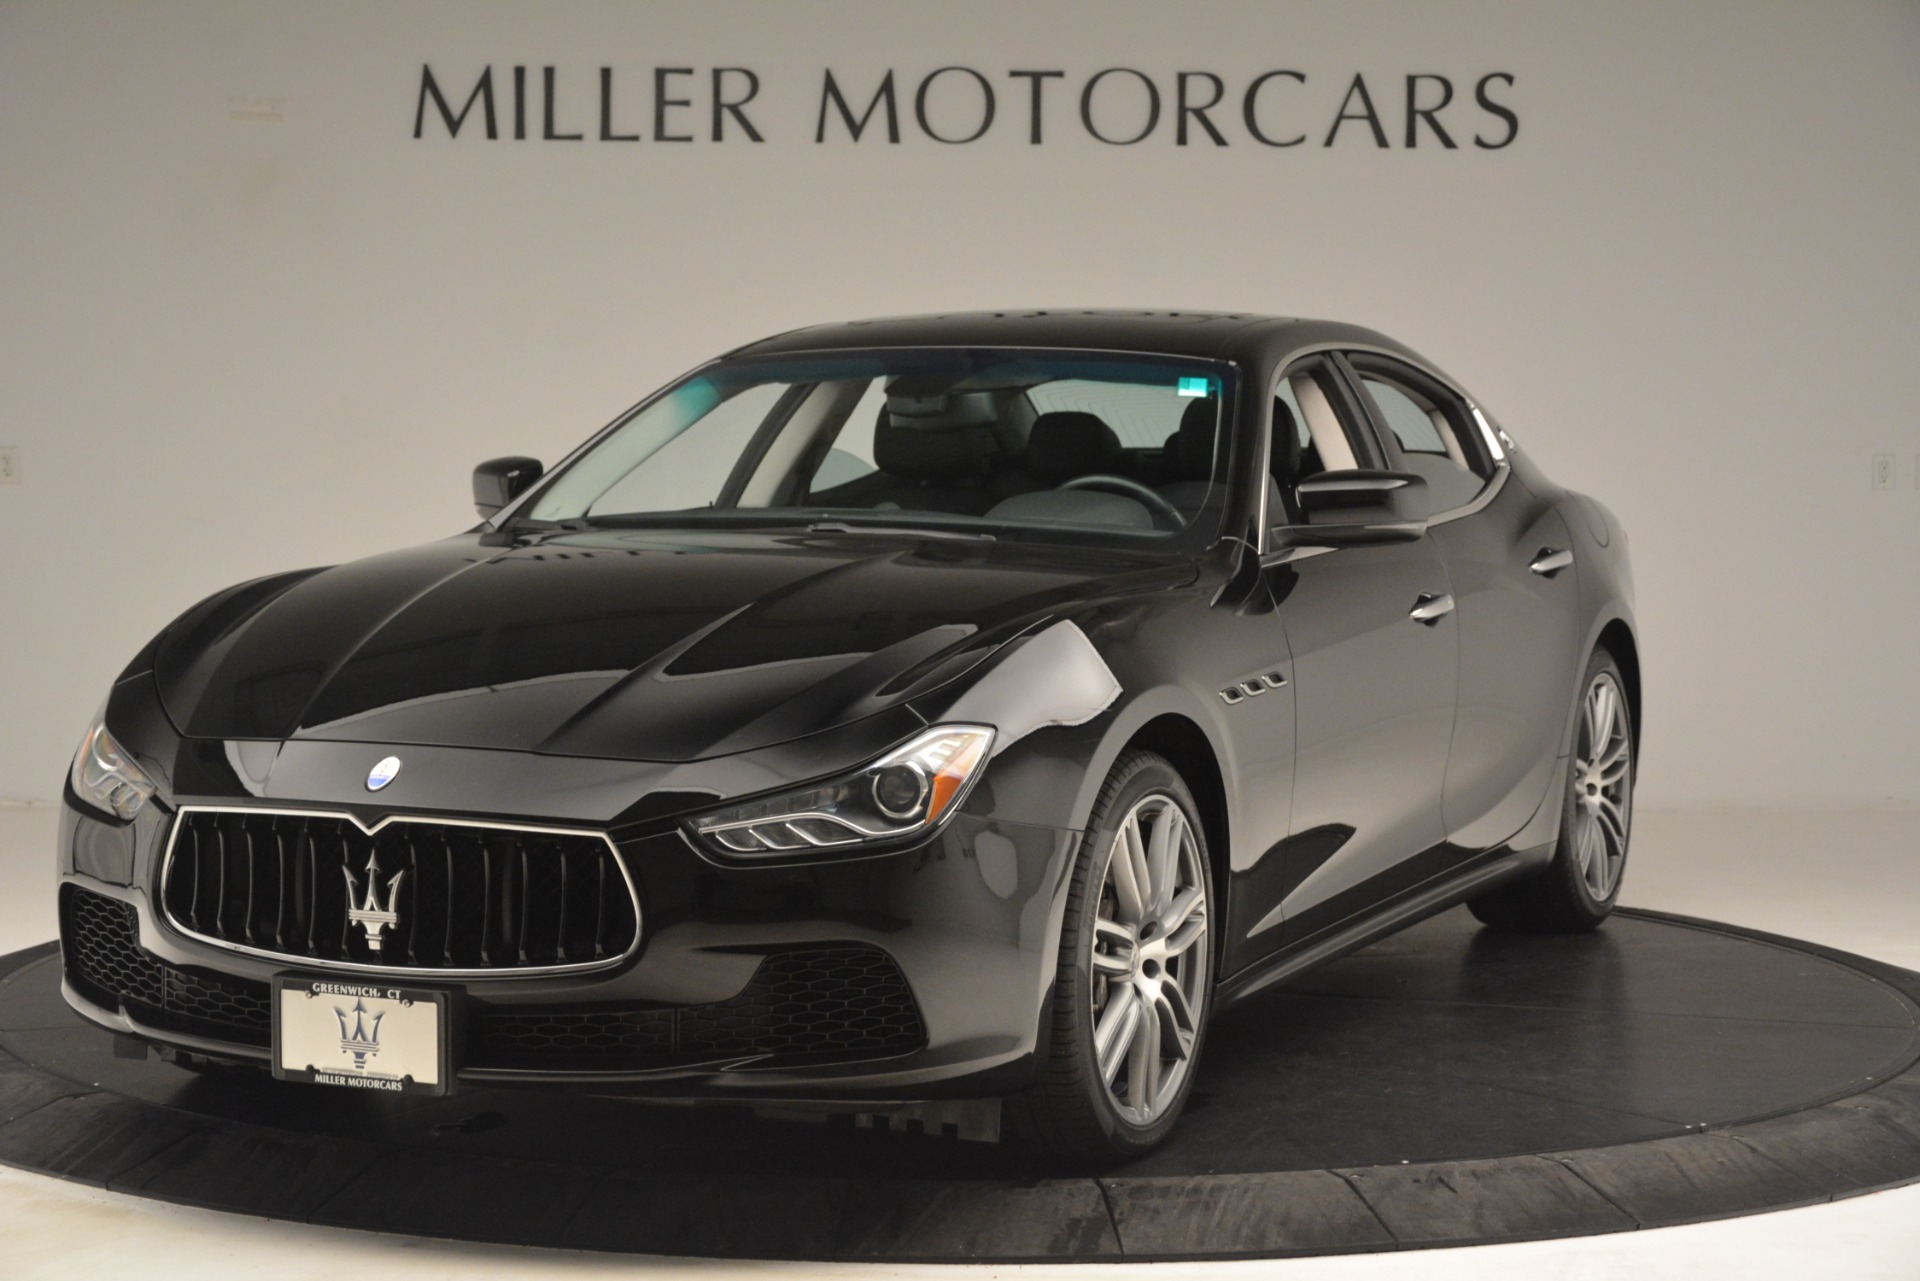 Used 2015 Maserati Ghibli S Q4 for sale Sold at Maserati of Westport in Westport CT 06880 1